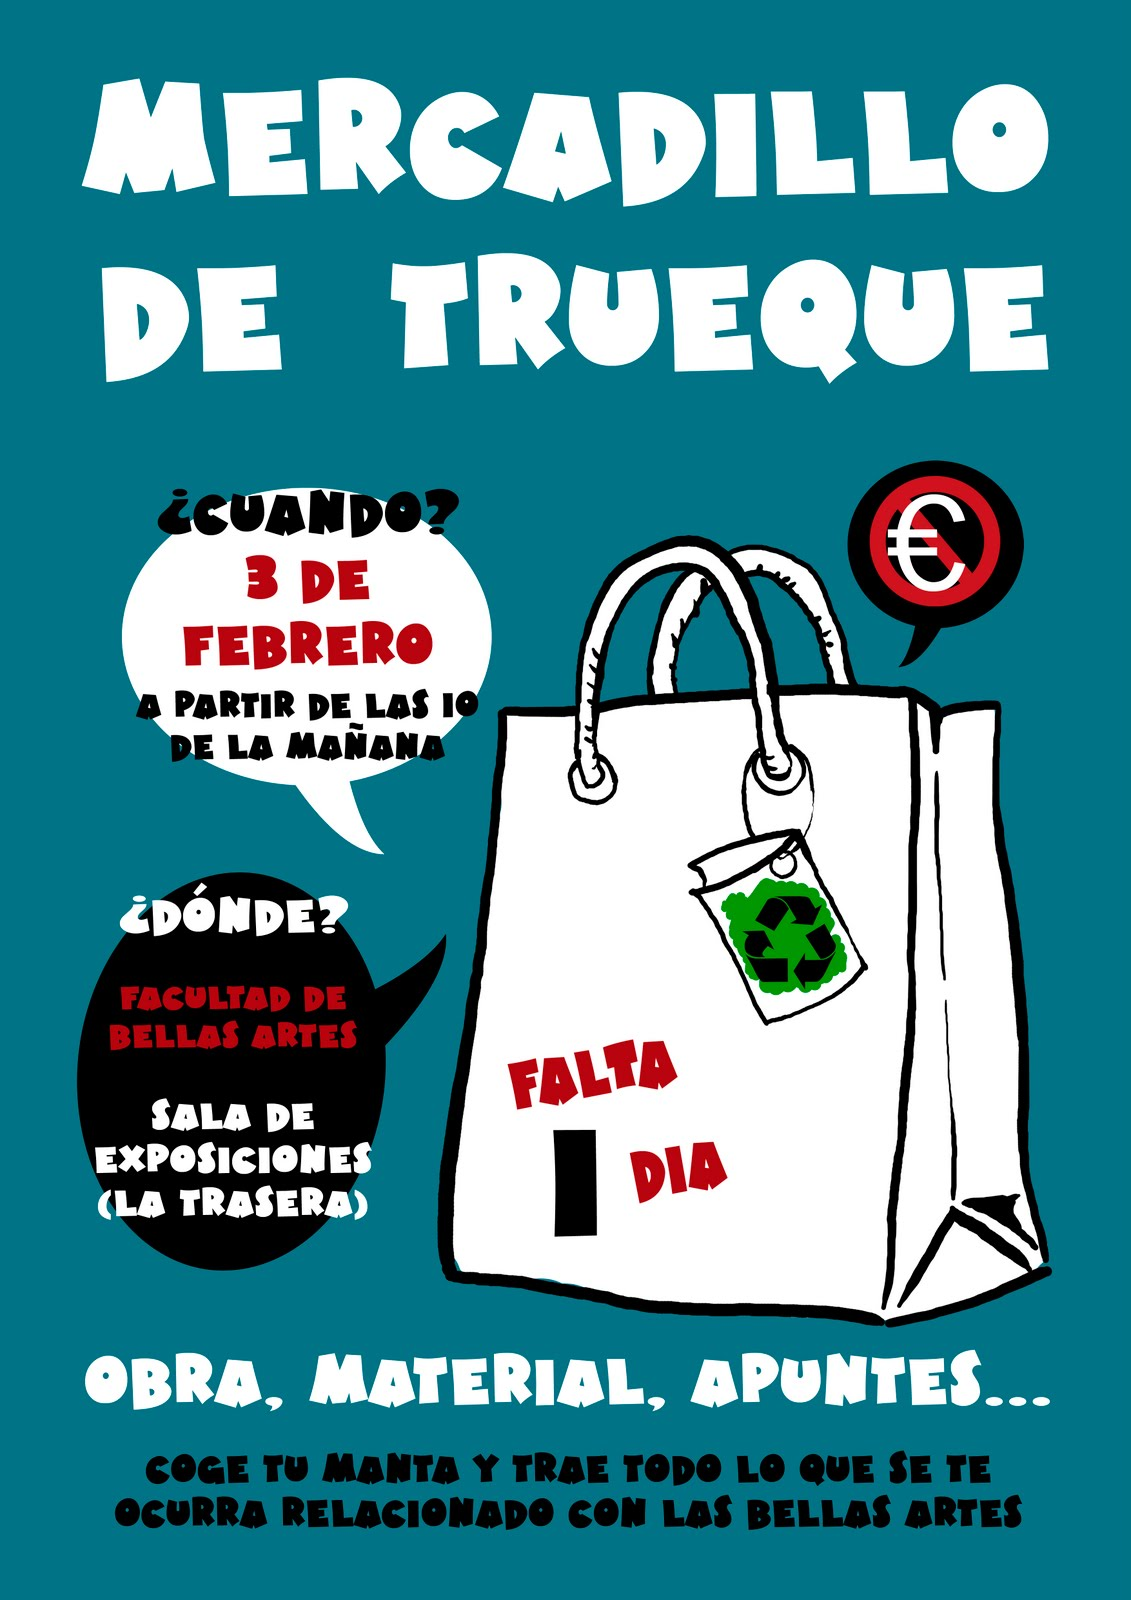 Mercadillos madrile os more 1er mercadillo del trueque - Mercadillos madrid capital ...